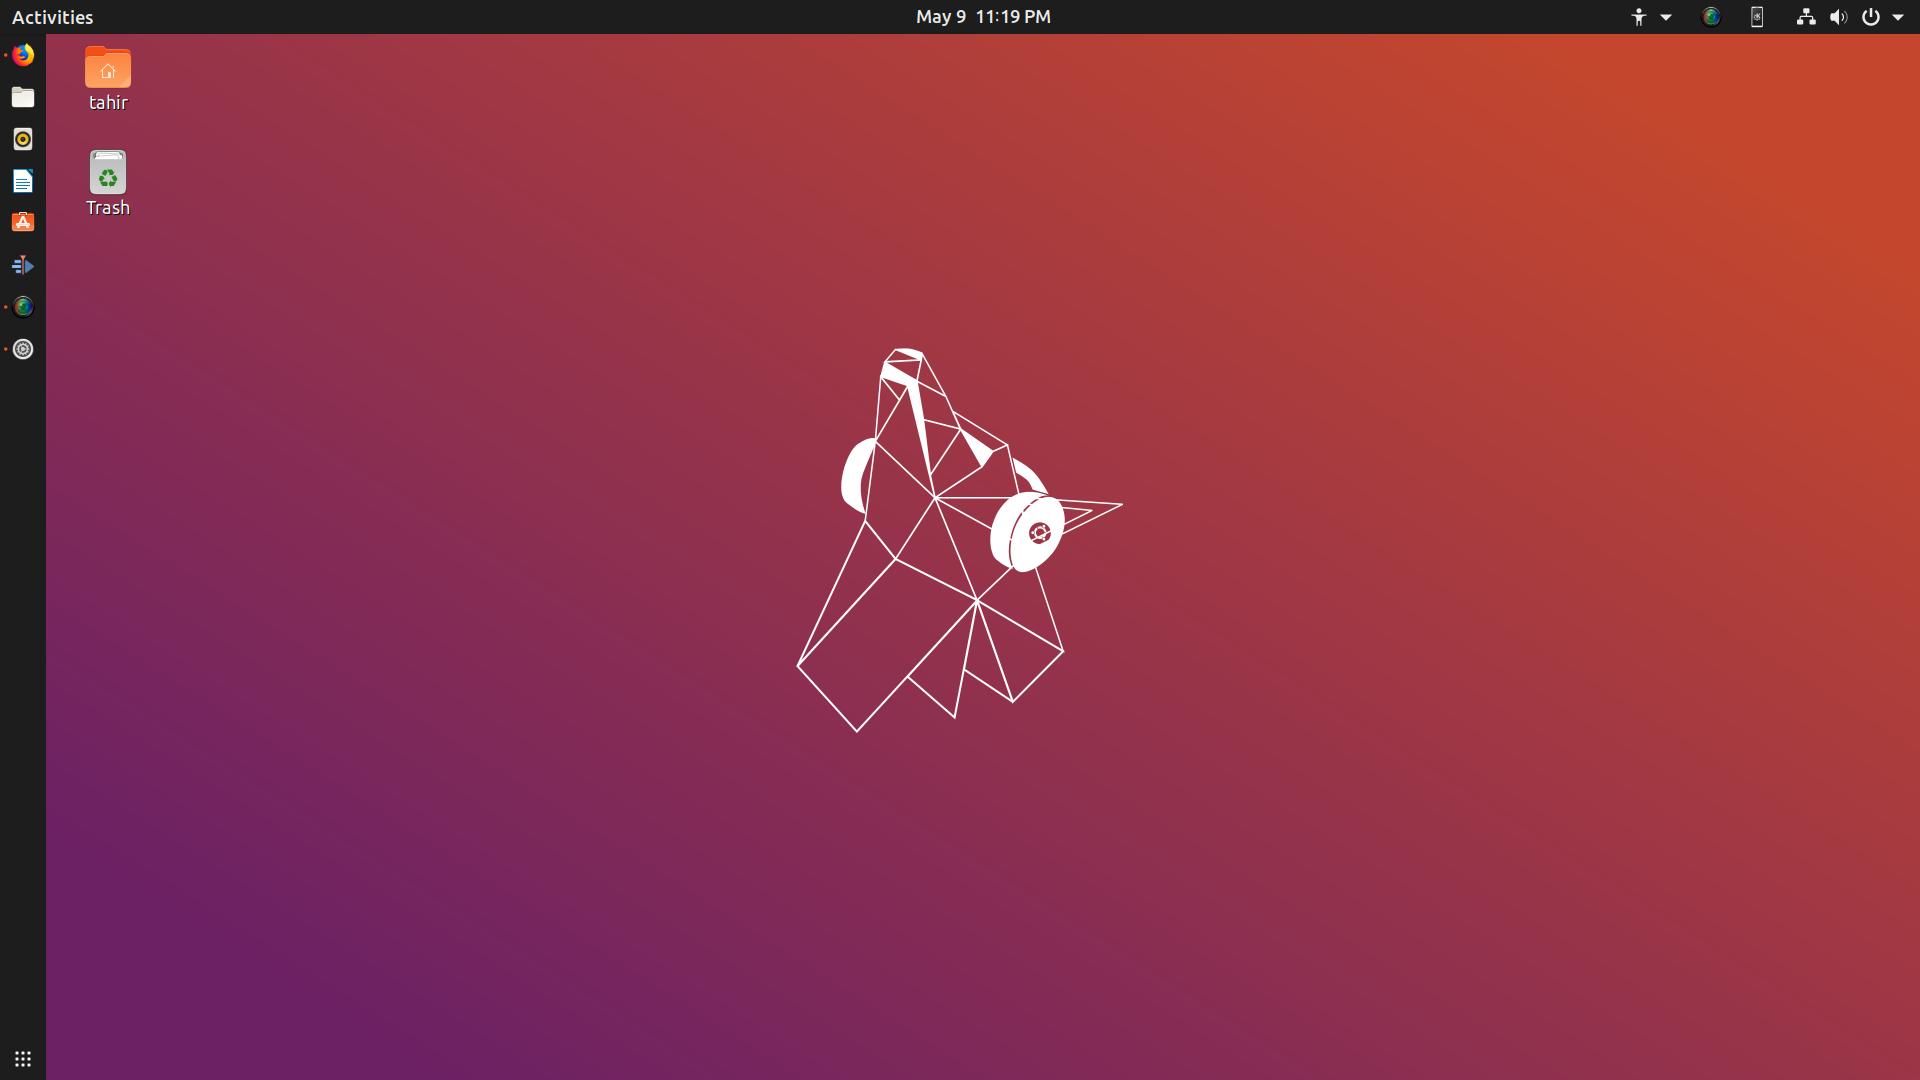 Ubuntu 19 04 Disco Dingo Desktop Wallpaper Wallpaper Desktop Wallpaper Picture Folder